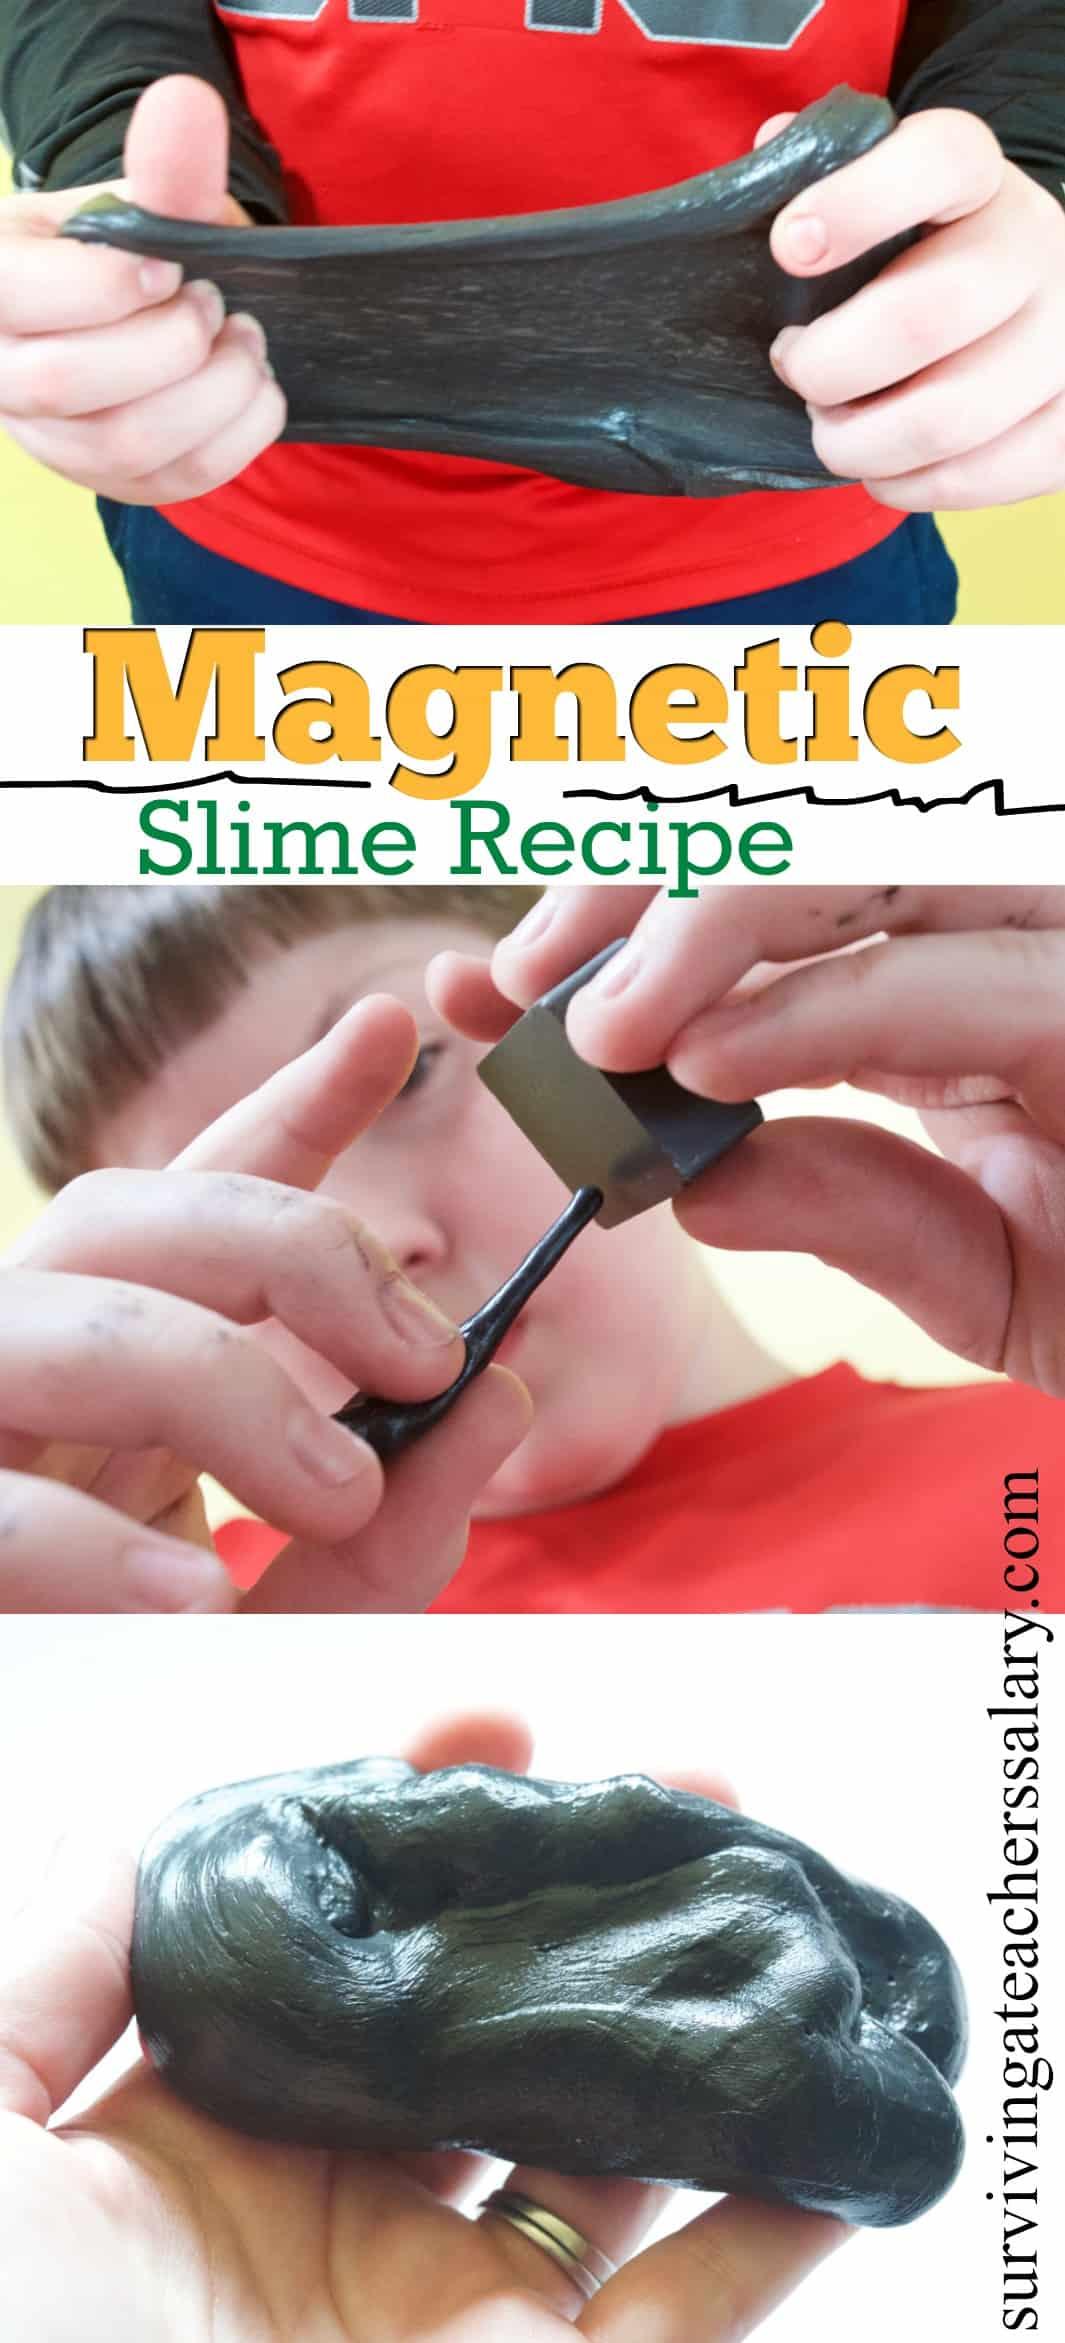 magnetic slime recipe photo tutorial